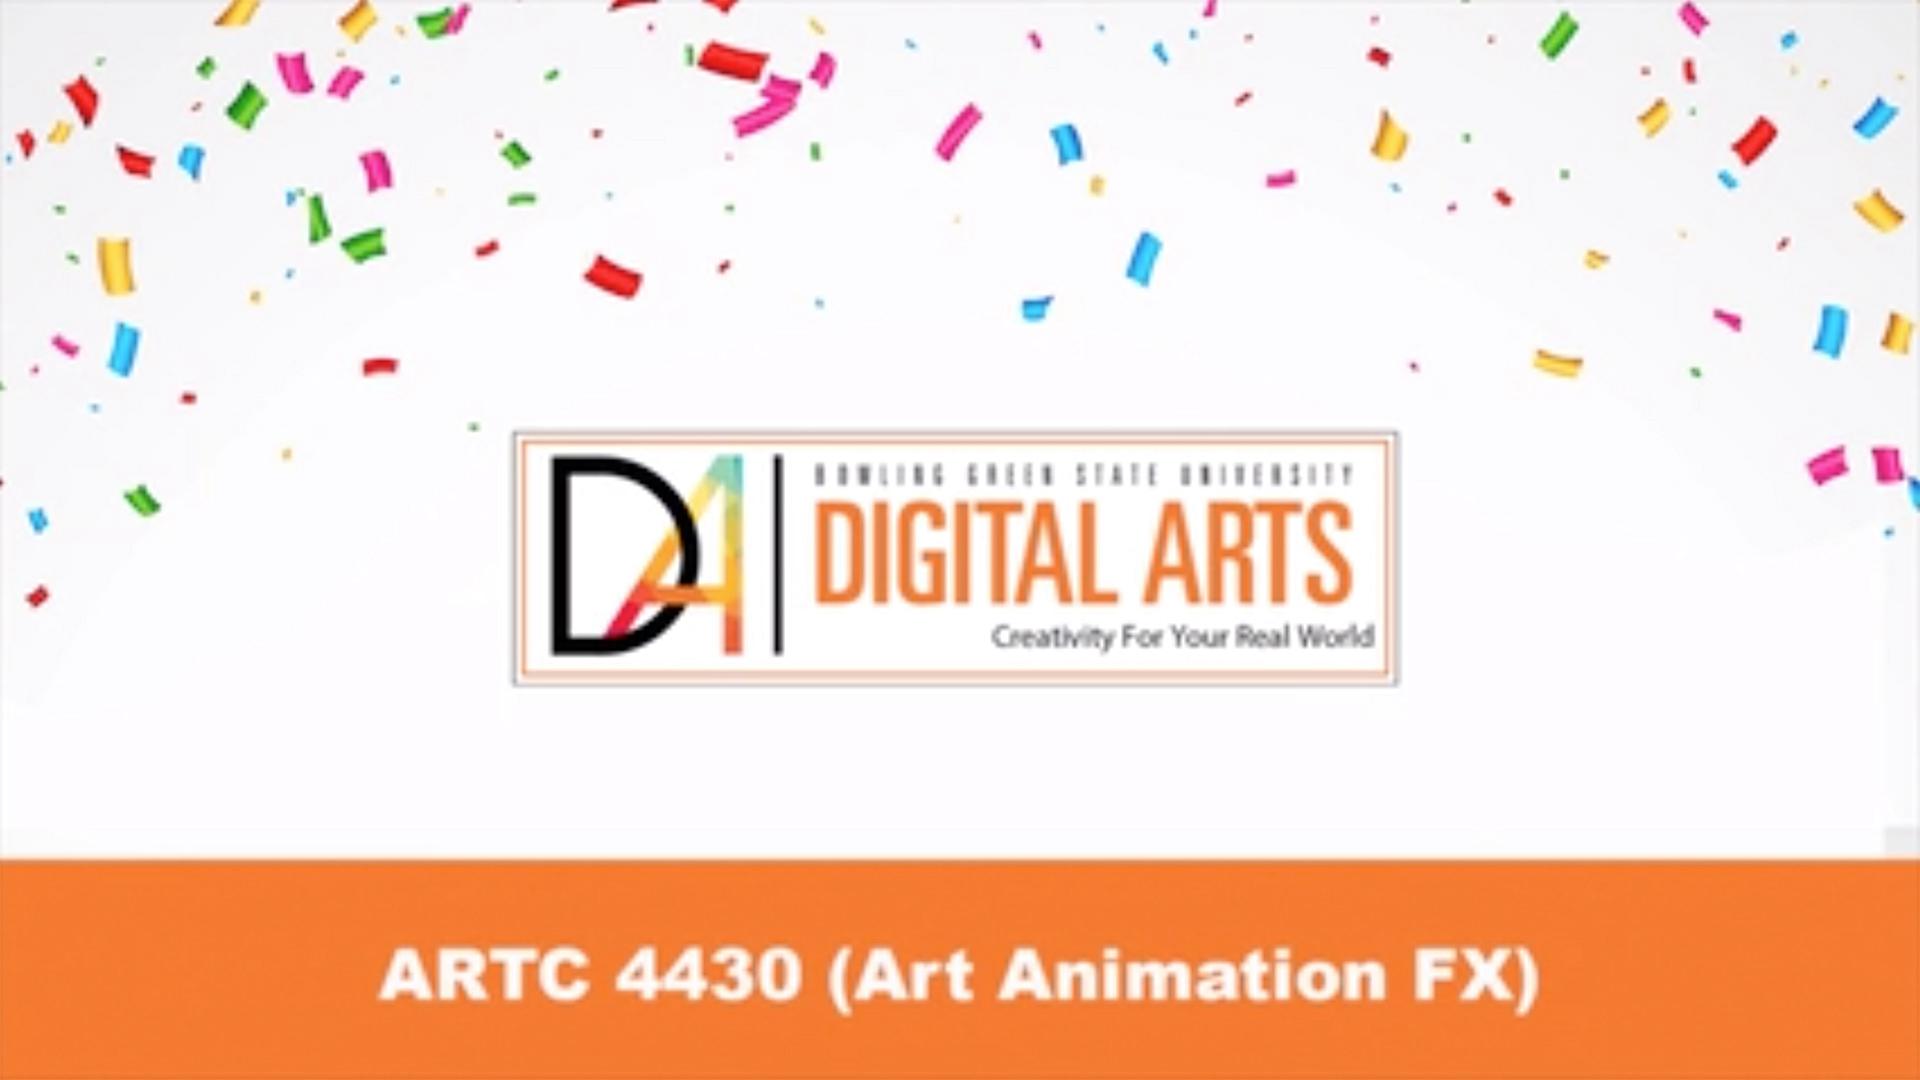 ARTC 4430, Art Animation FX